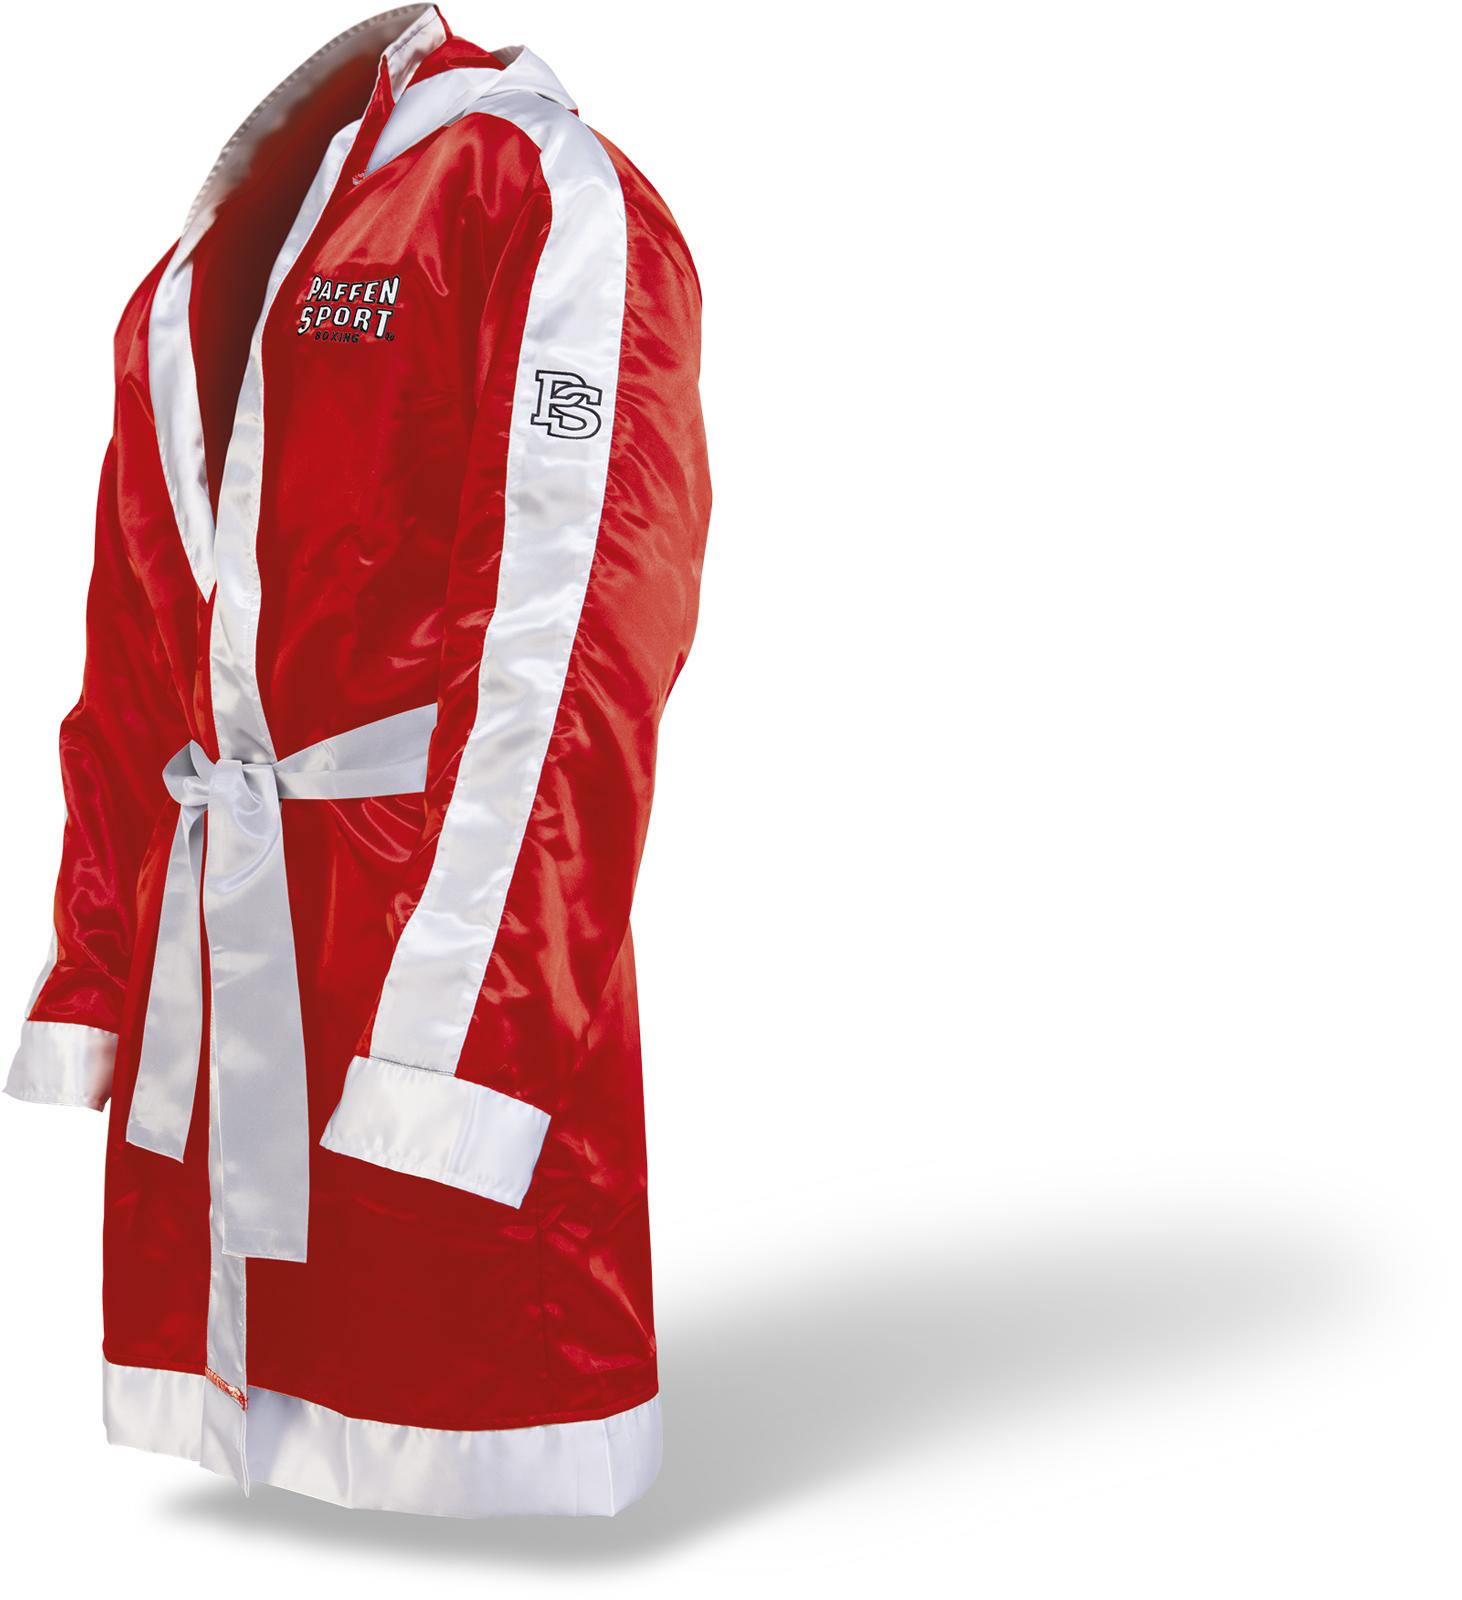 Боксерский халат с капюшоном Paffen sport